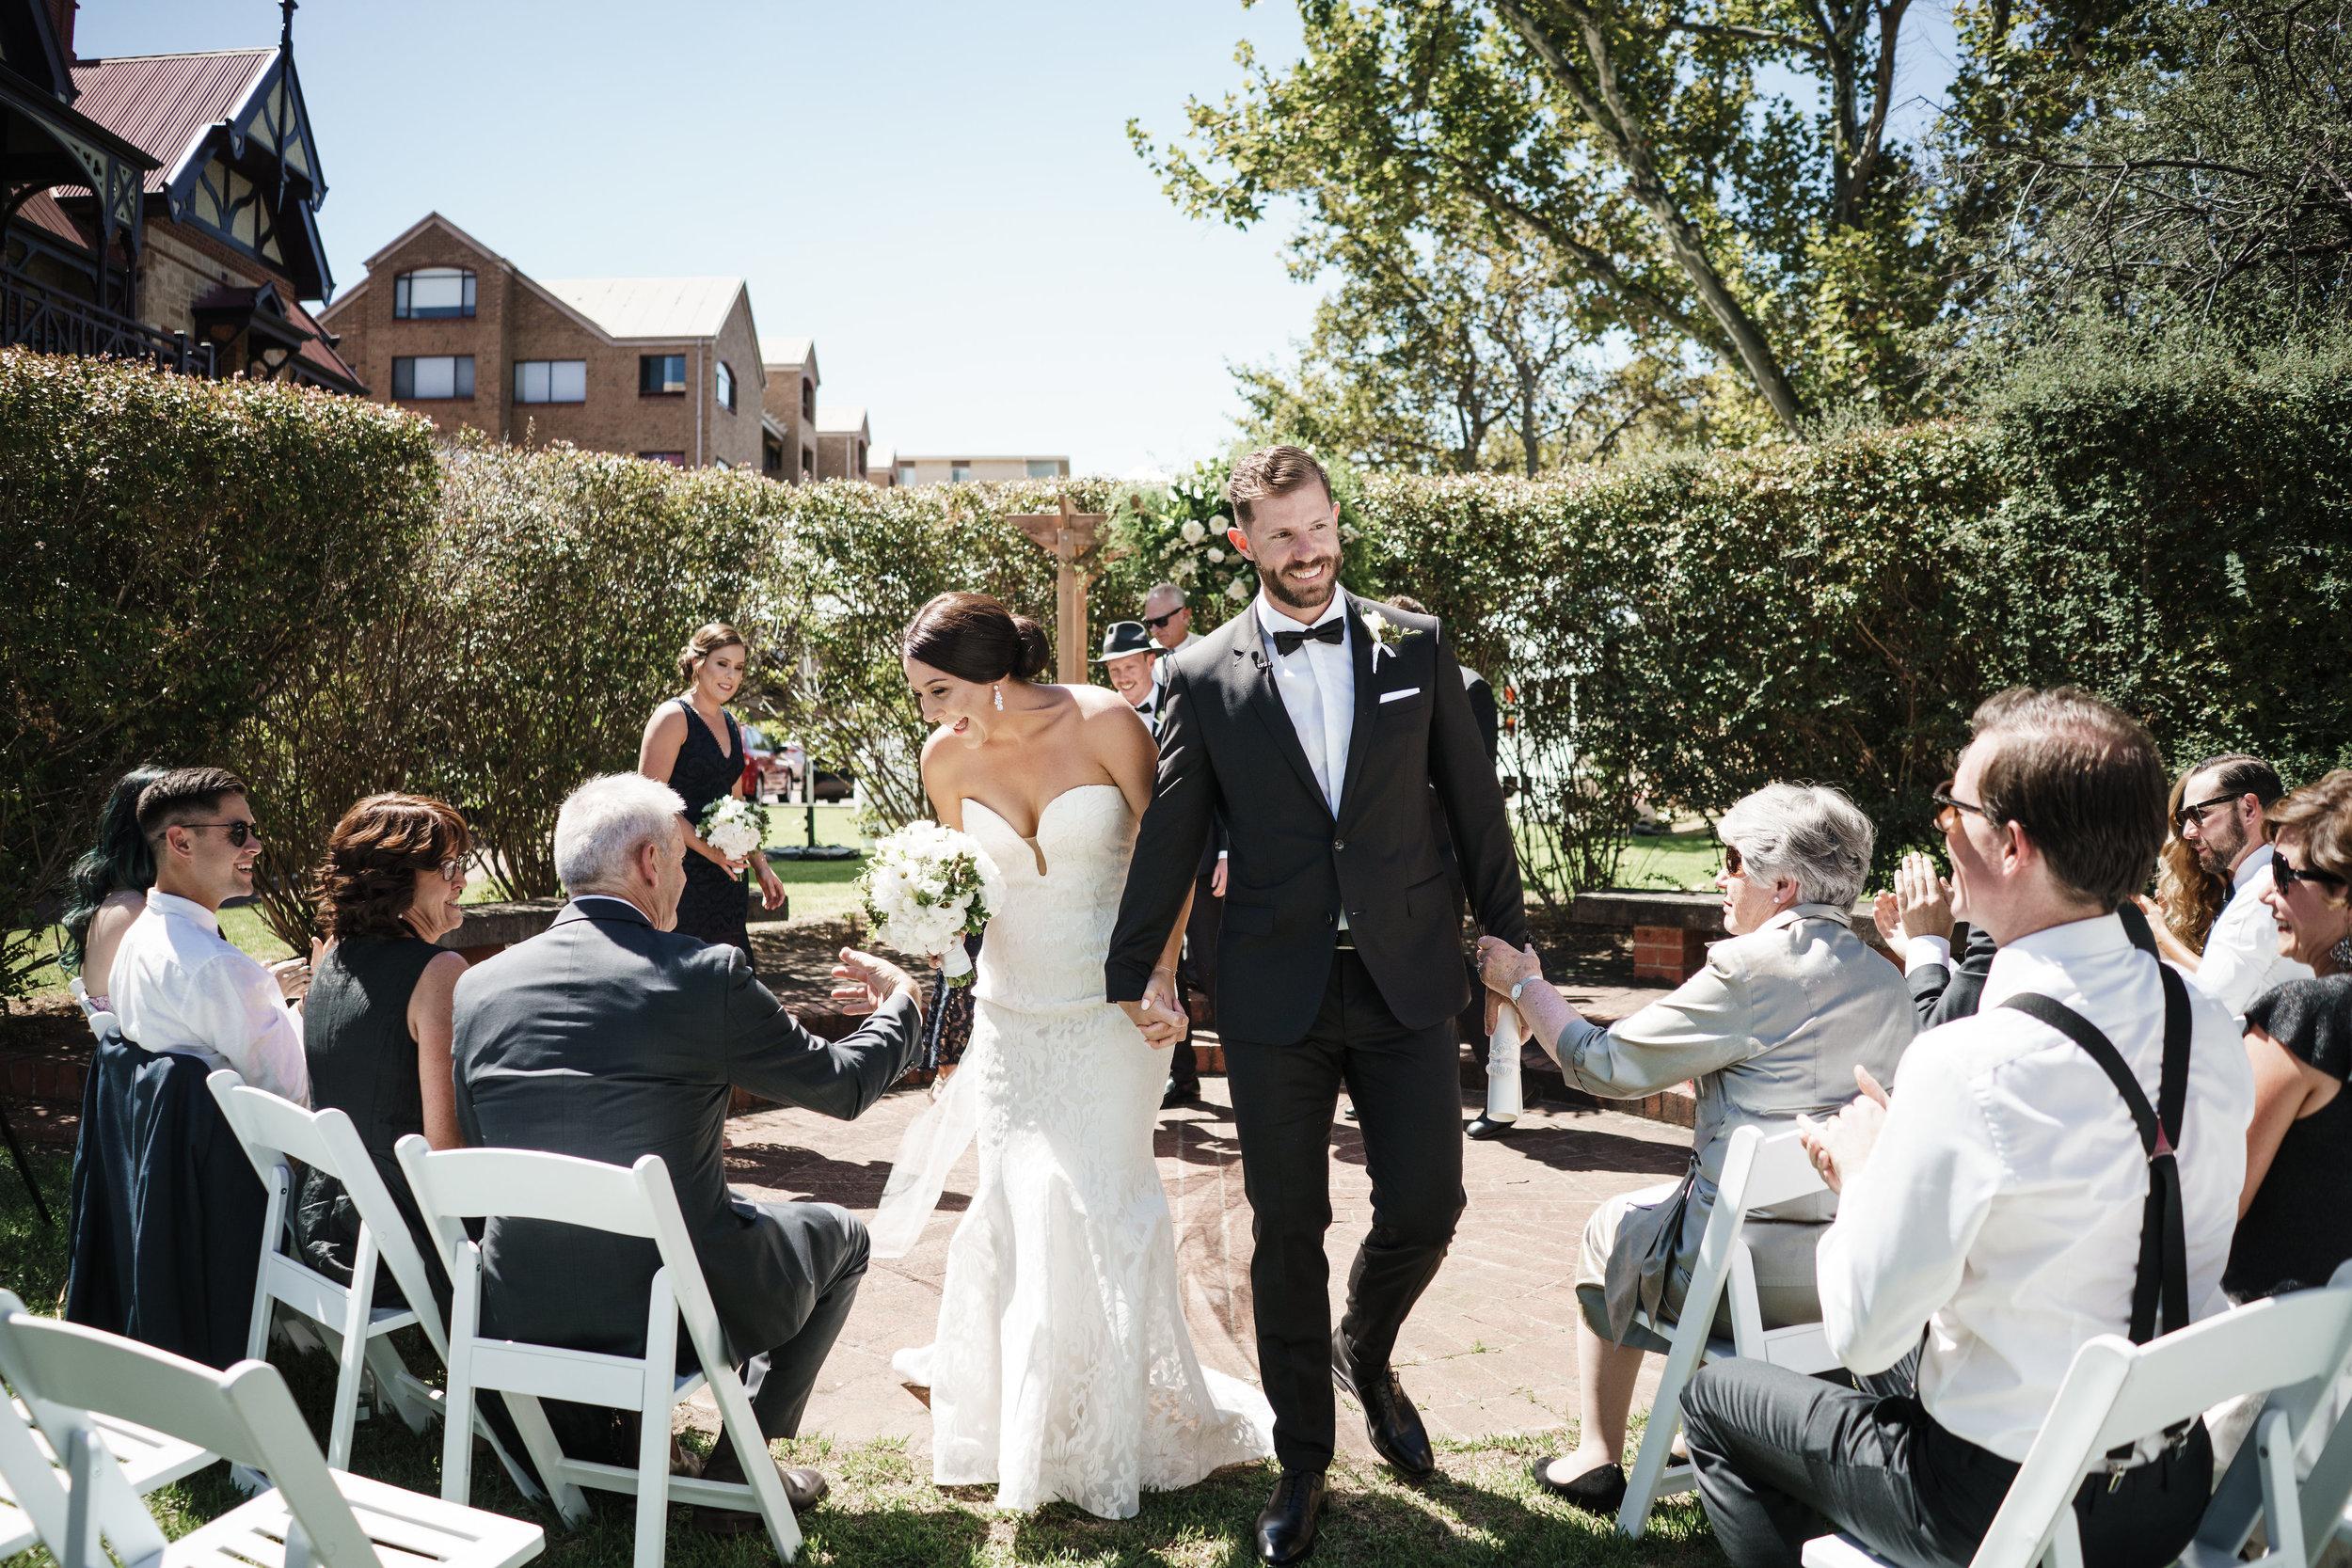 Carclew_house_wedding_Israel_Baldago_Photography-323.jpg